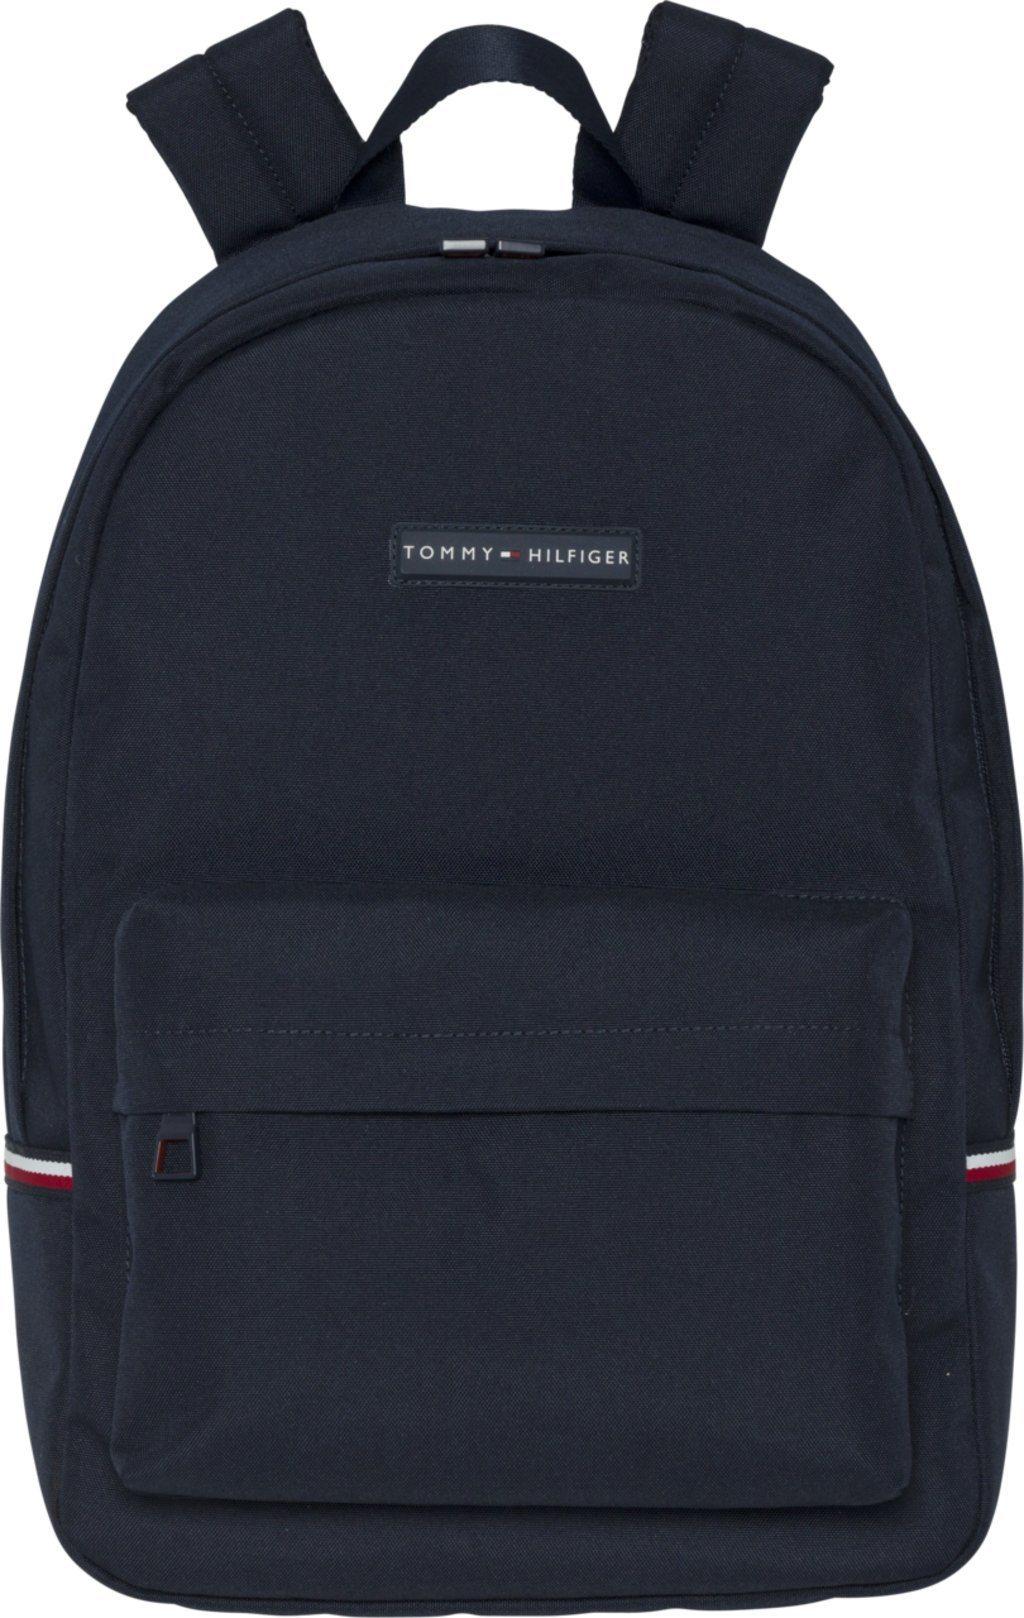 Tommy Hilfiger Tasche »TOMMY BACKPACK«